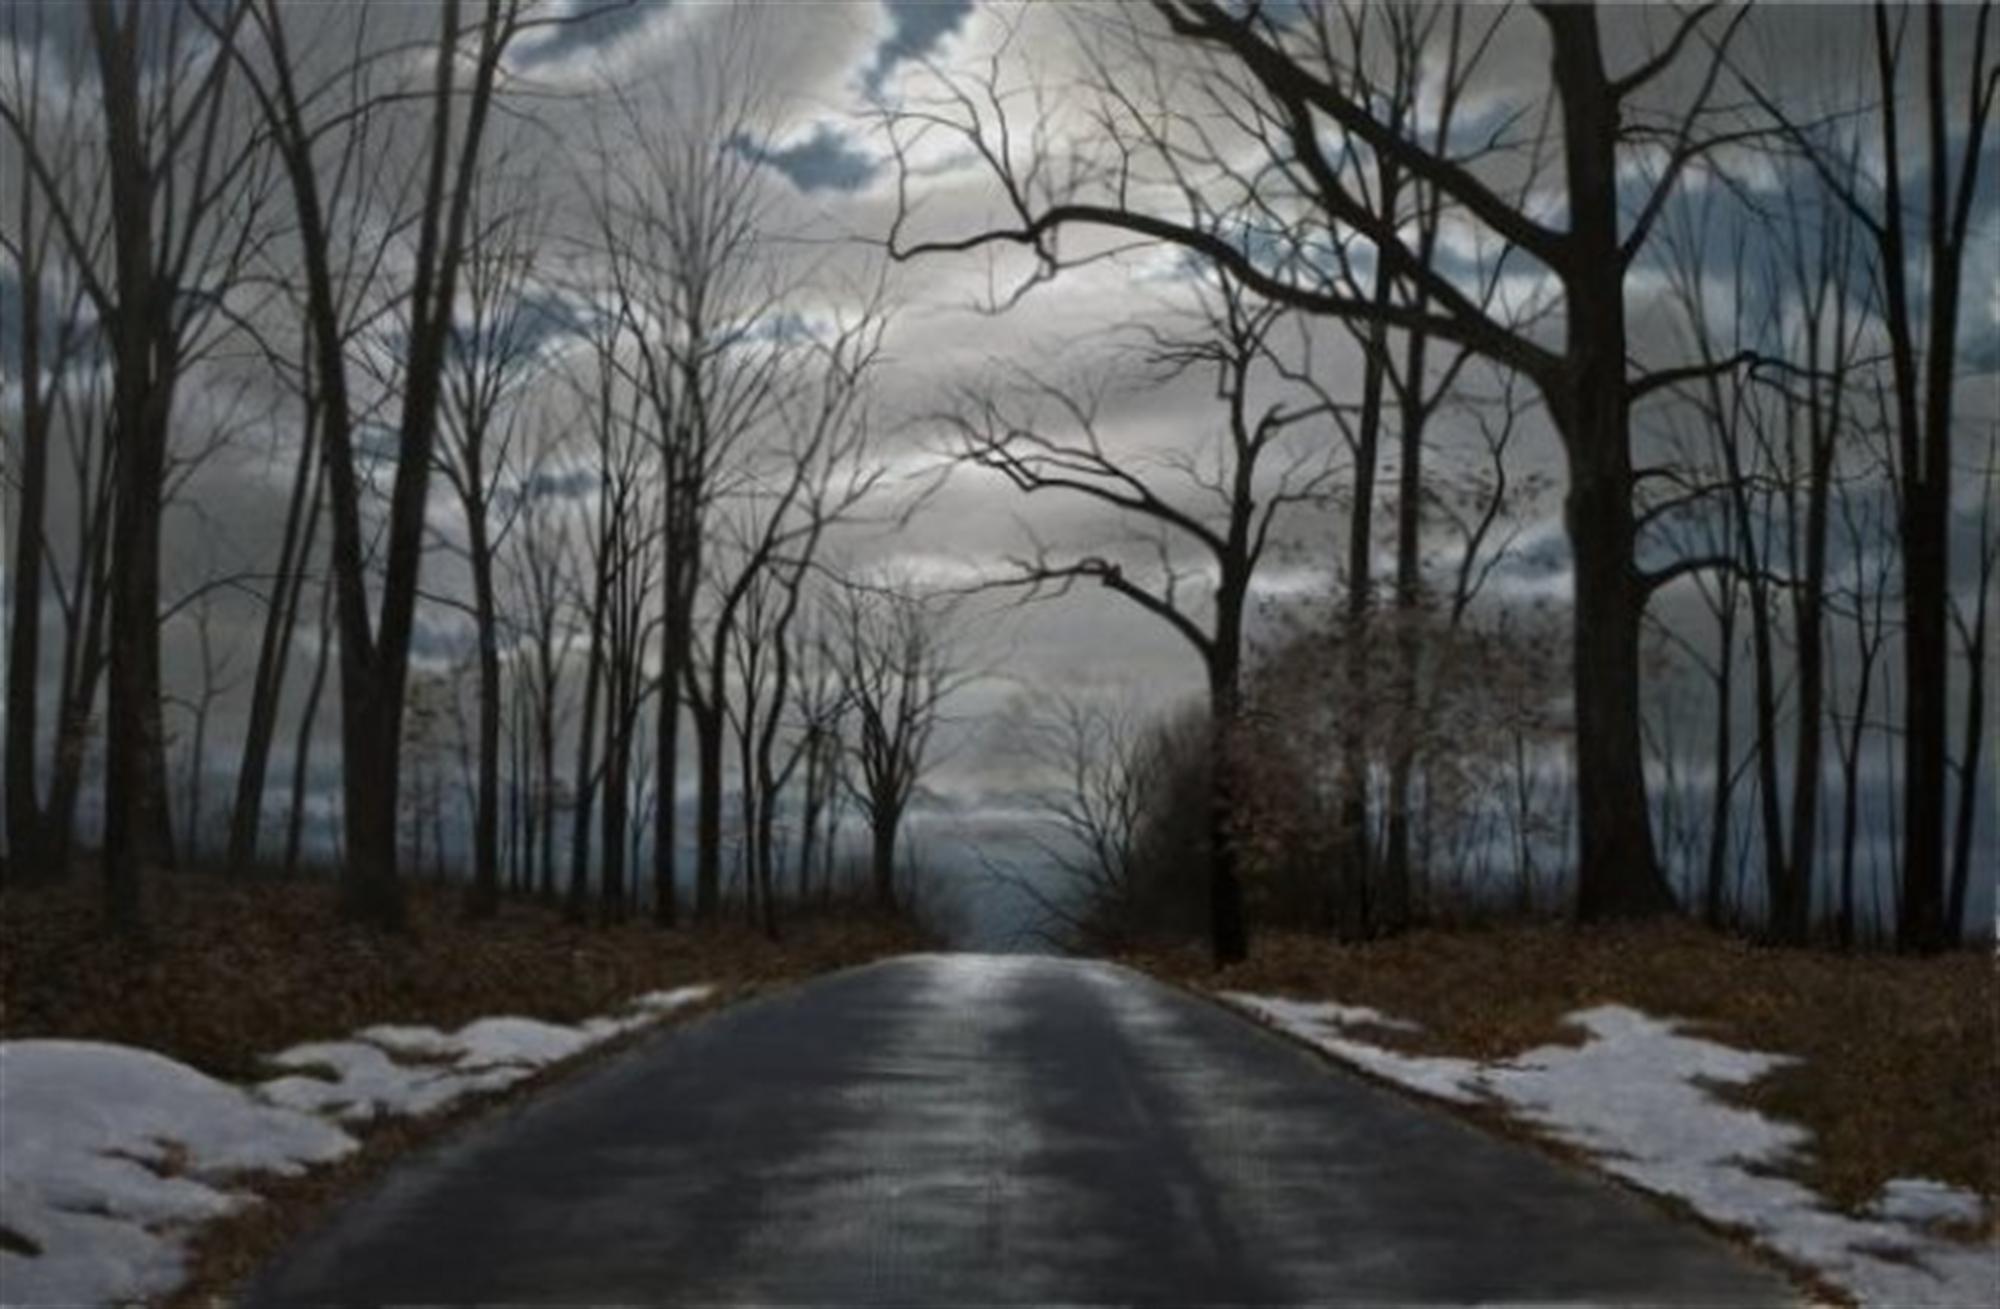 Night Road by Alexander Volkov